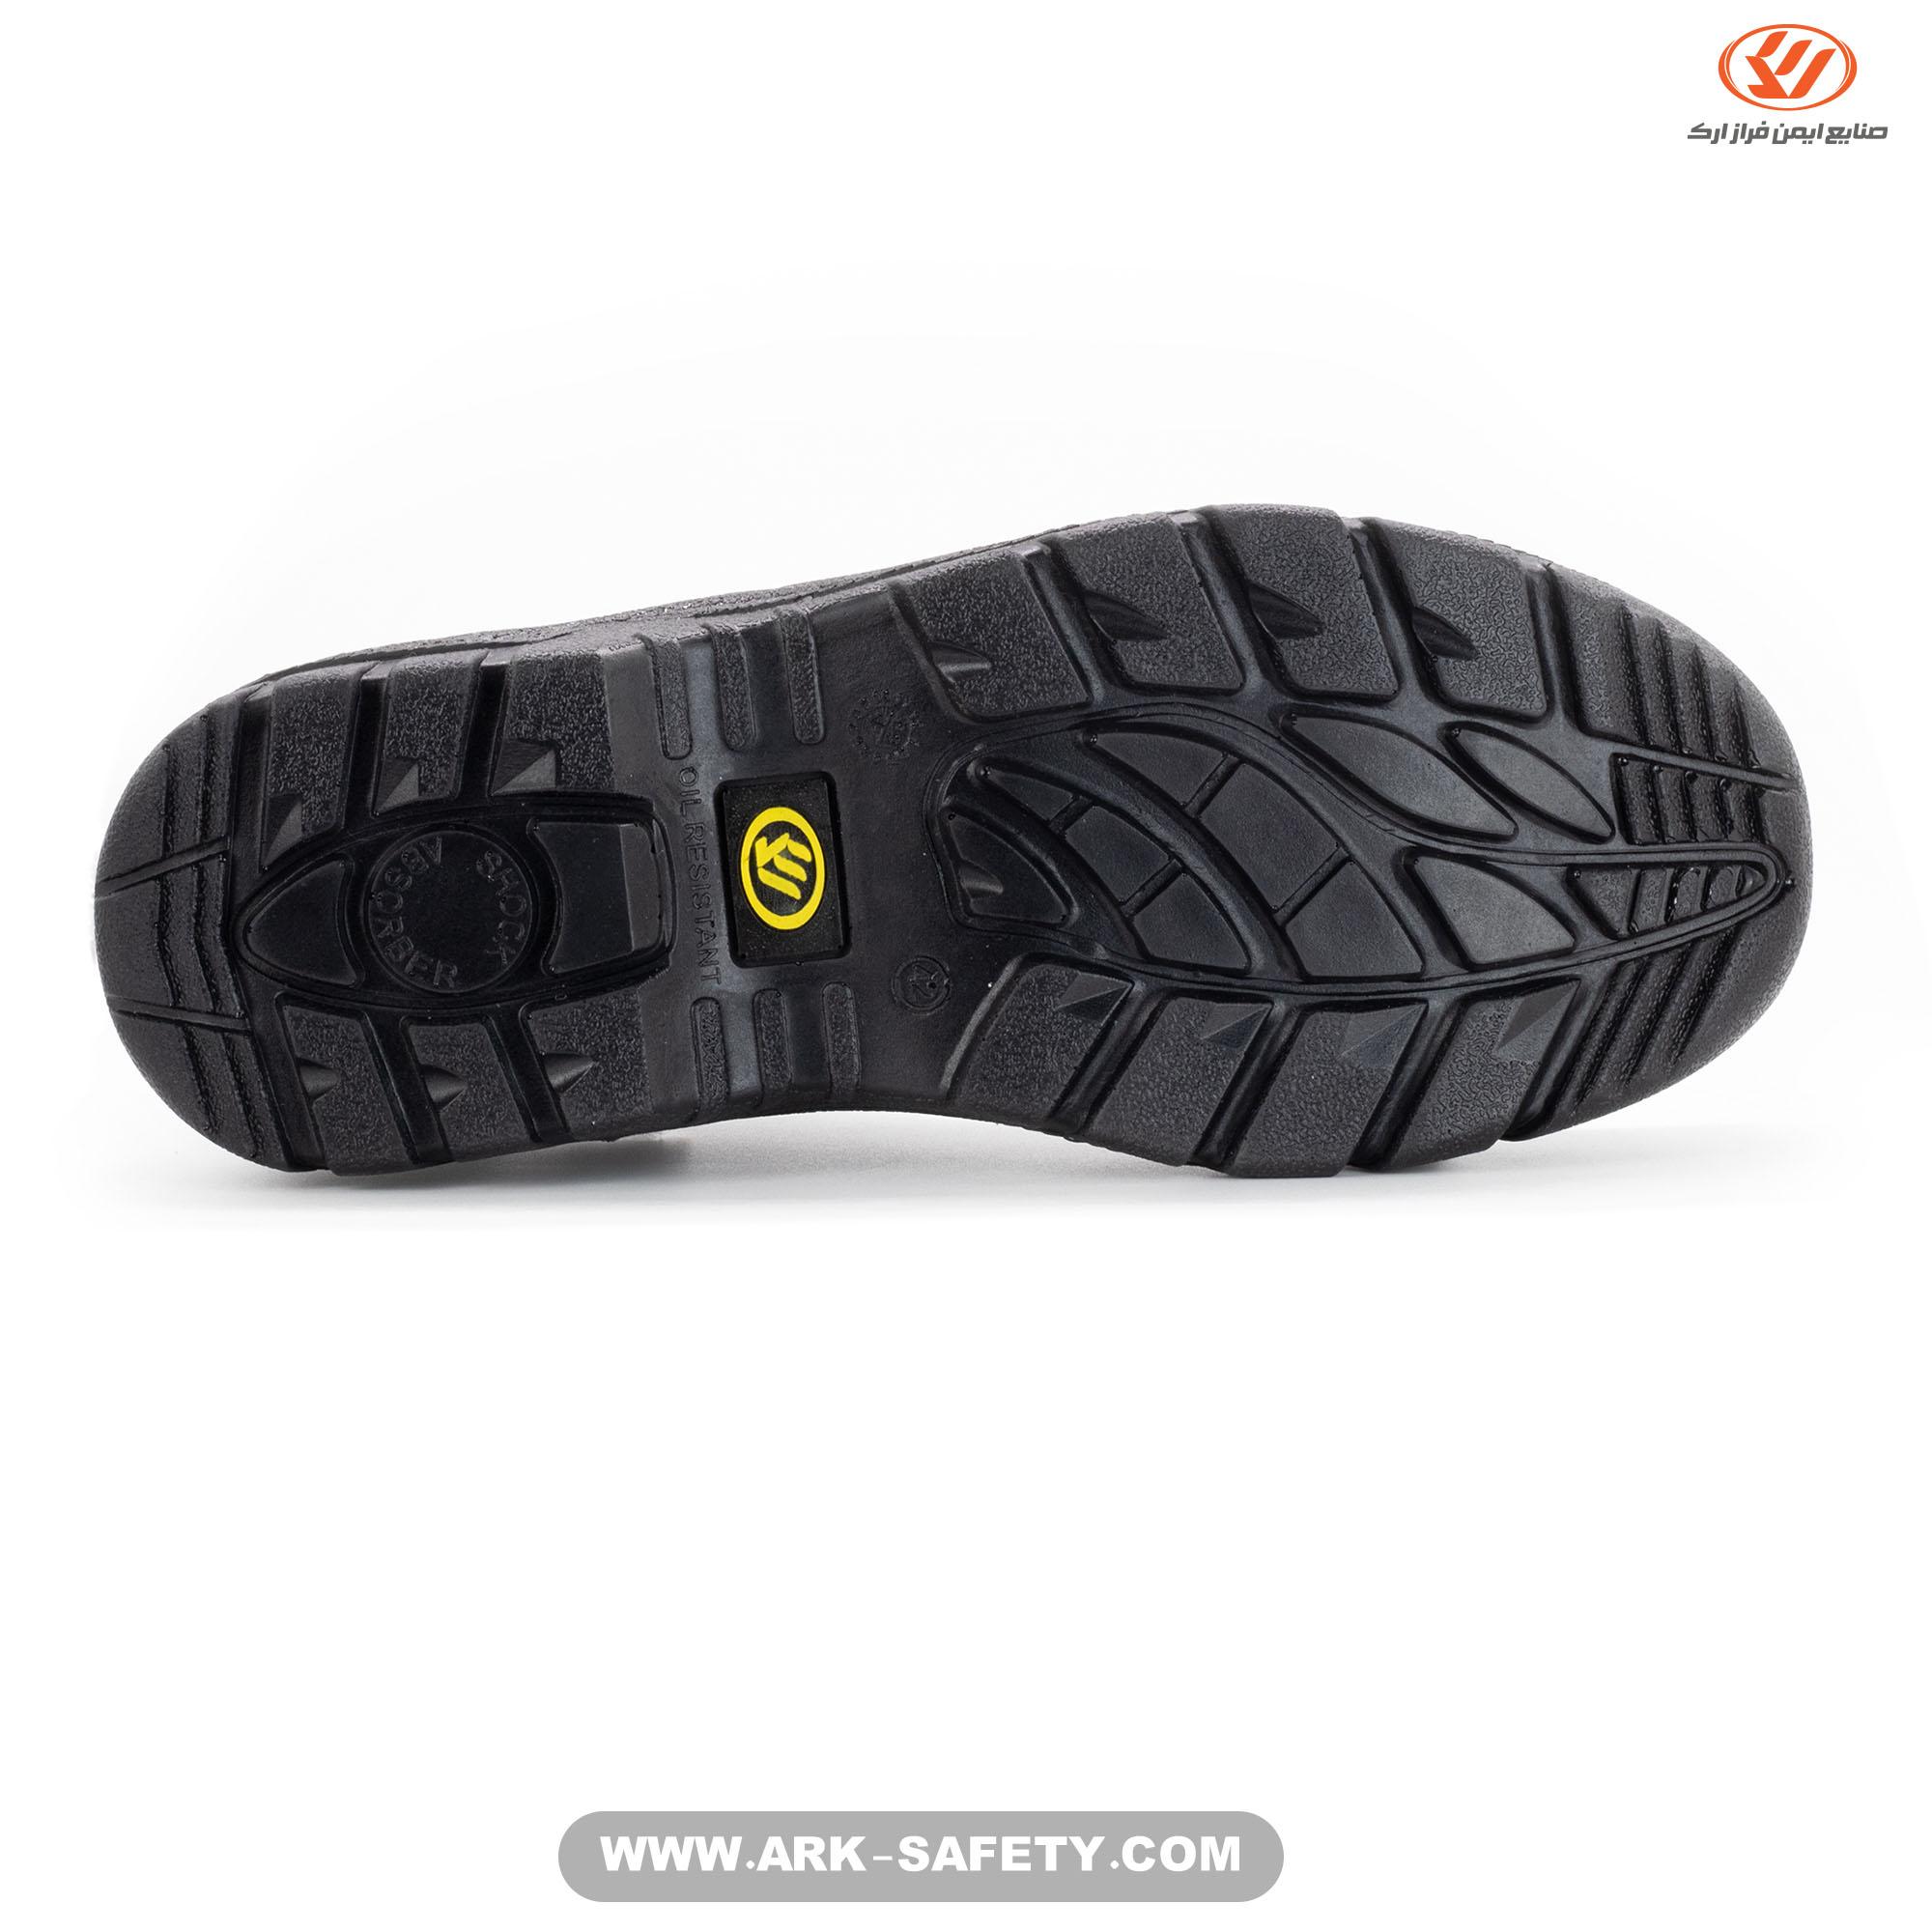 Welding Shoe